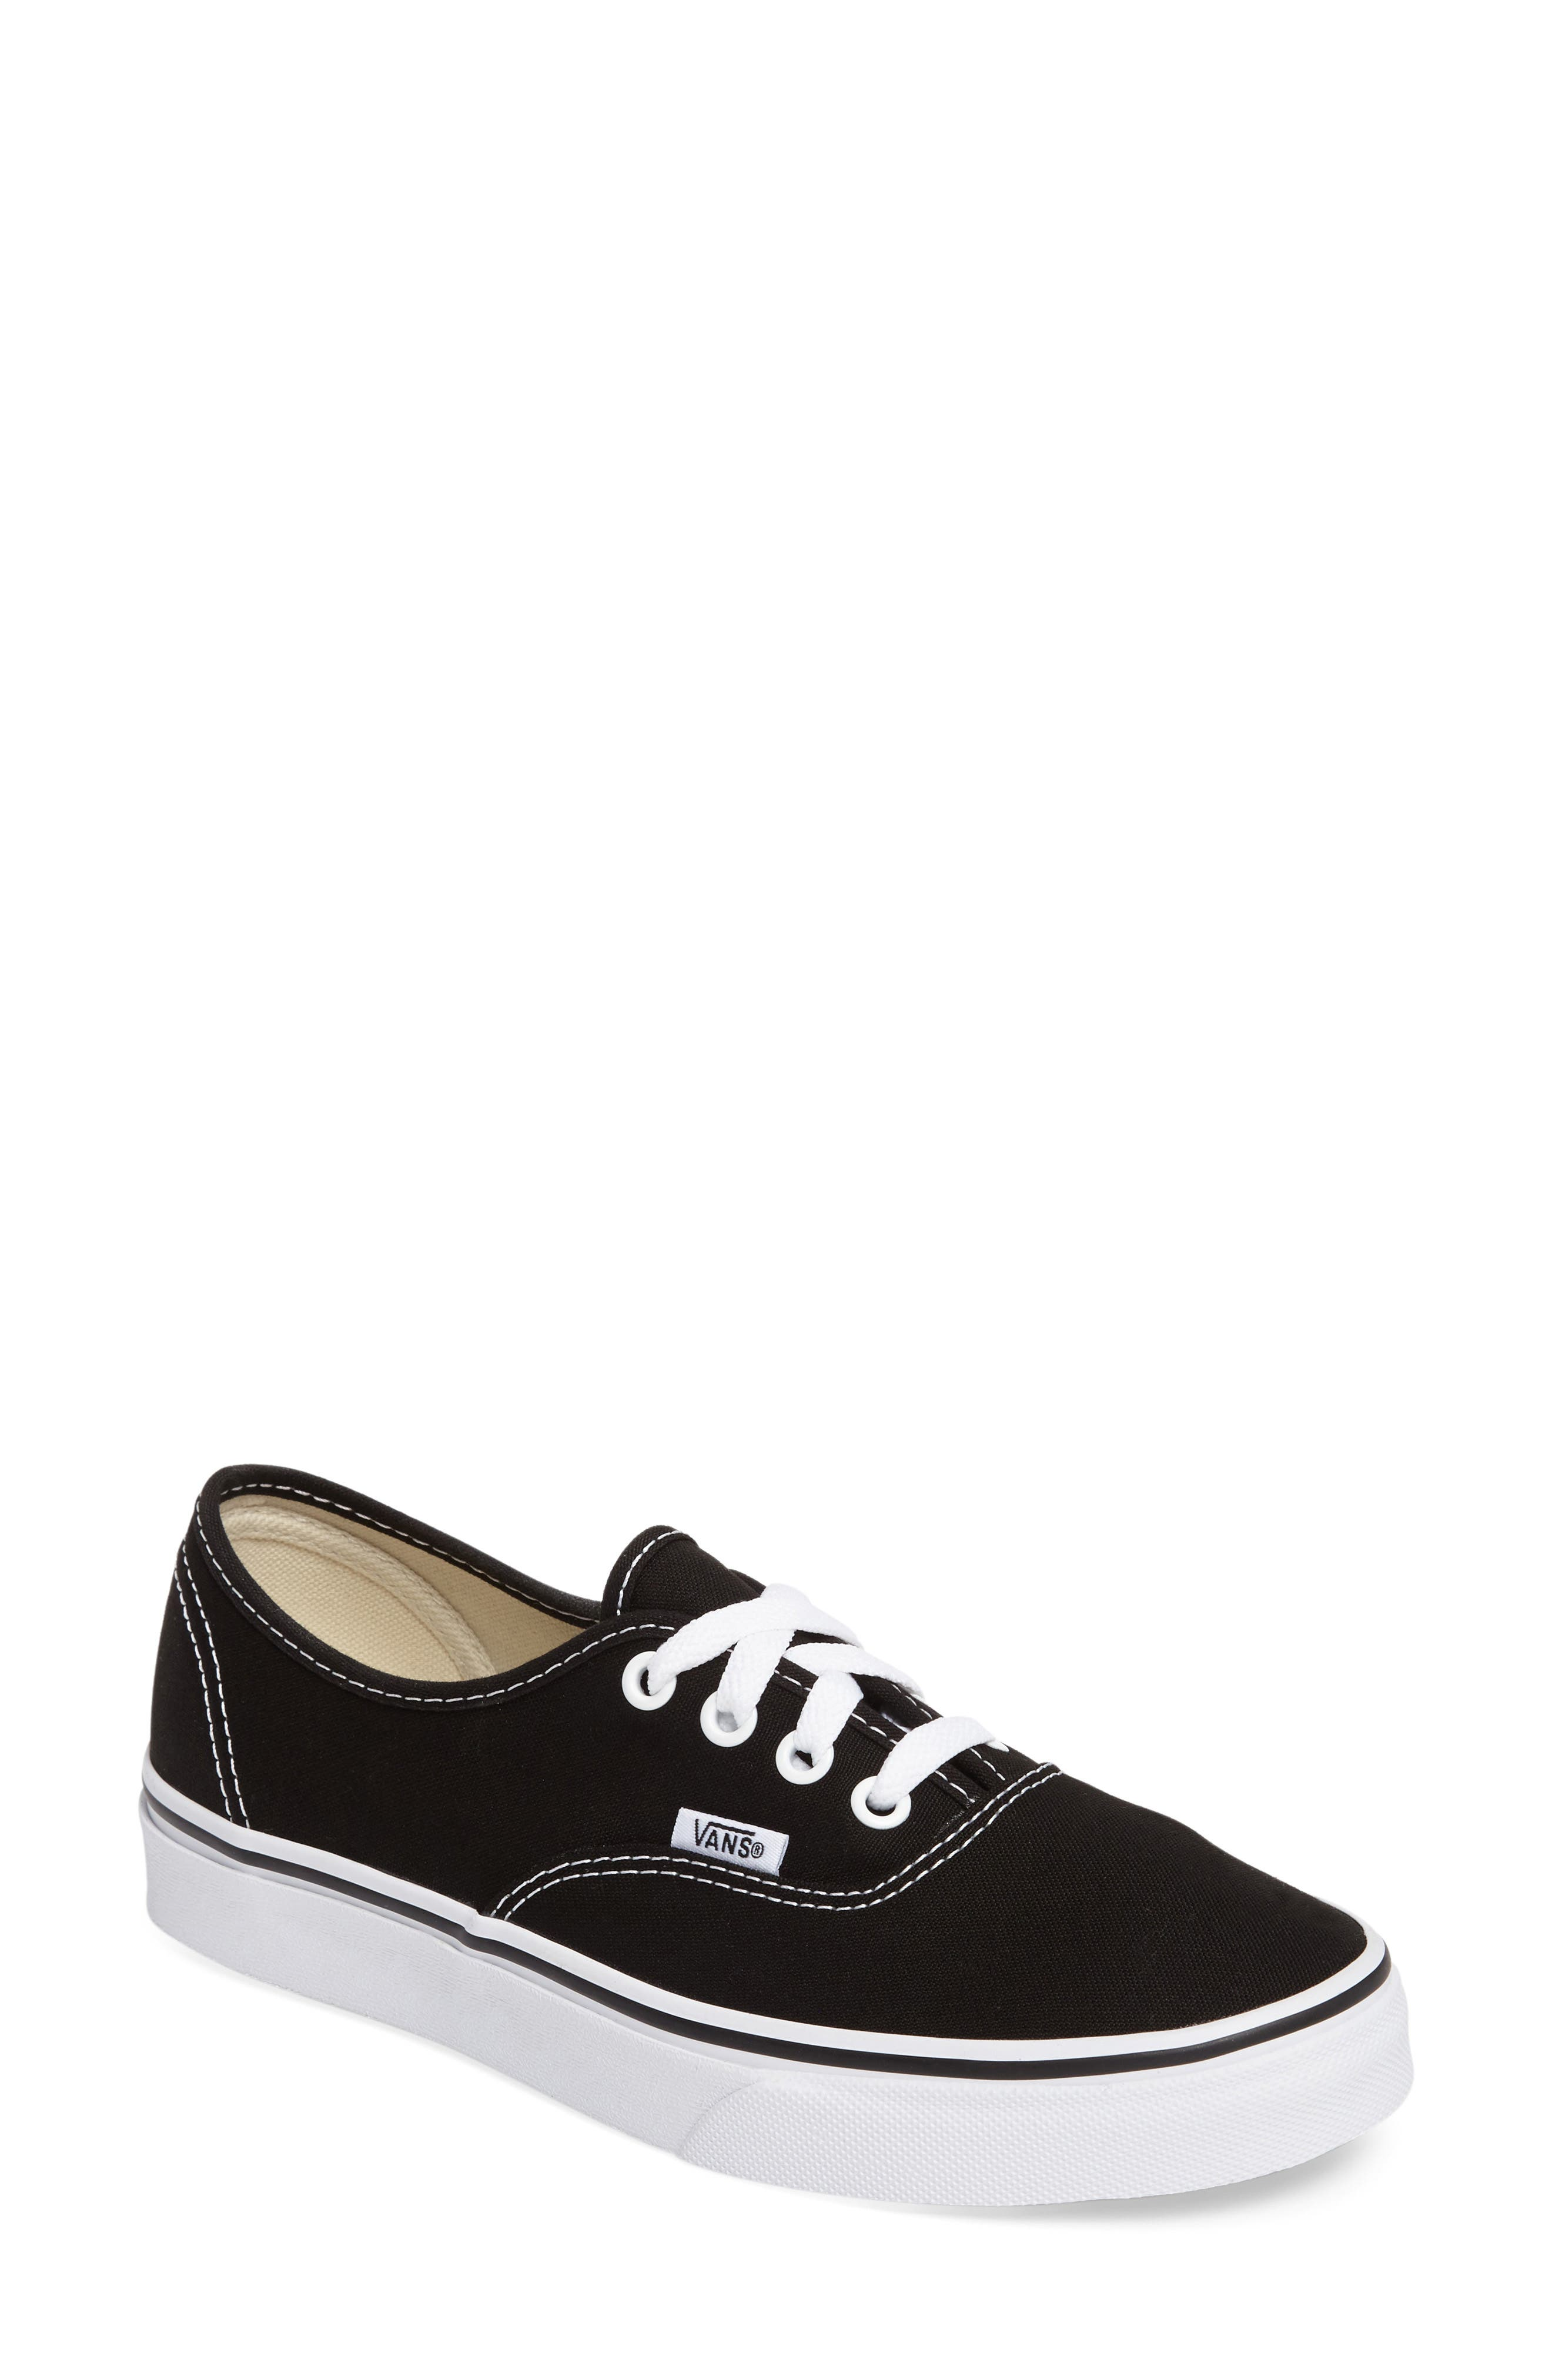 womens vans black and white